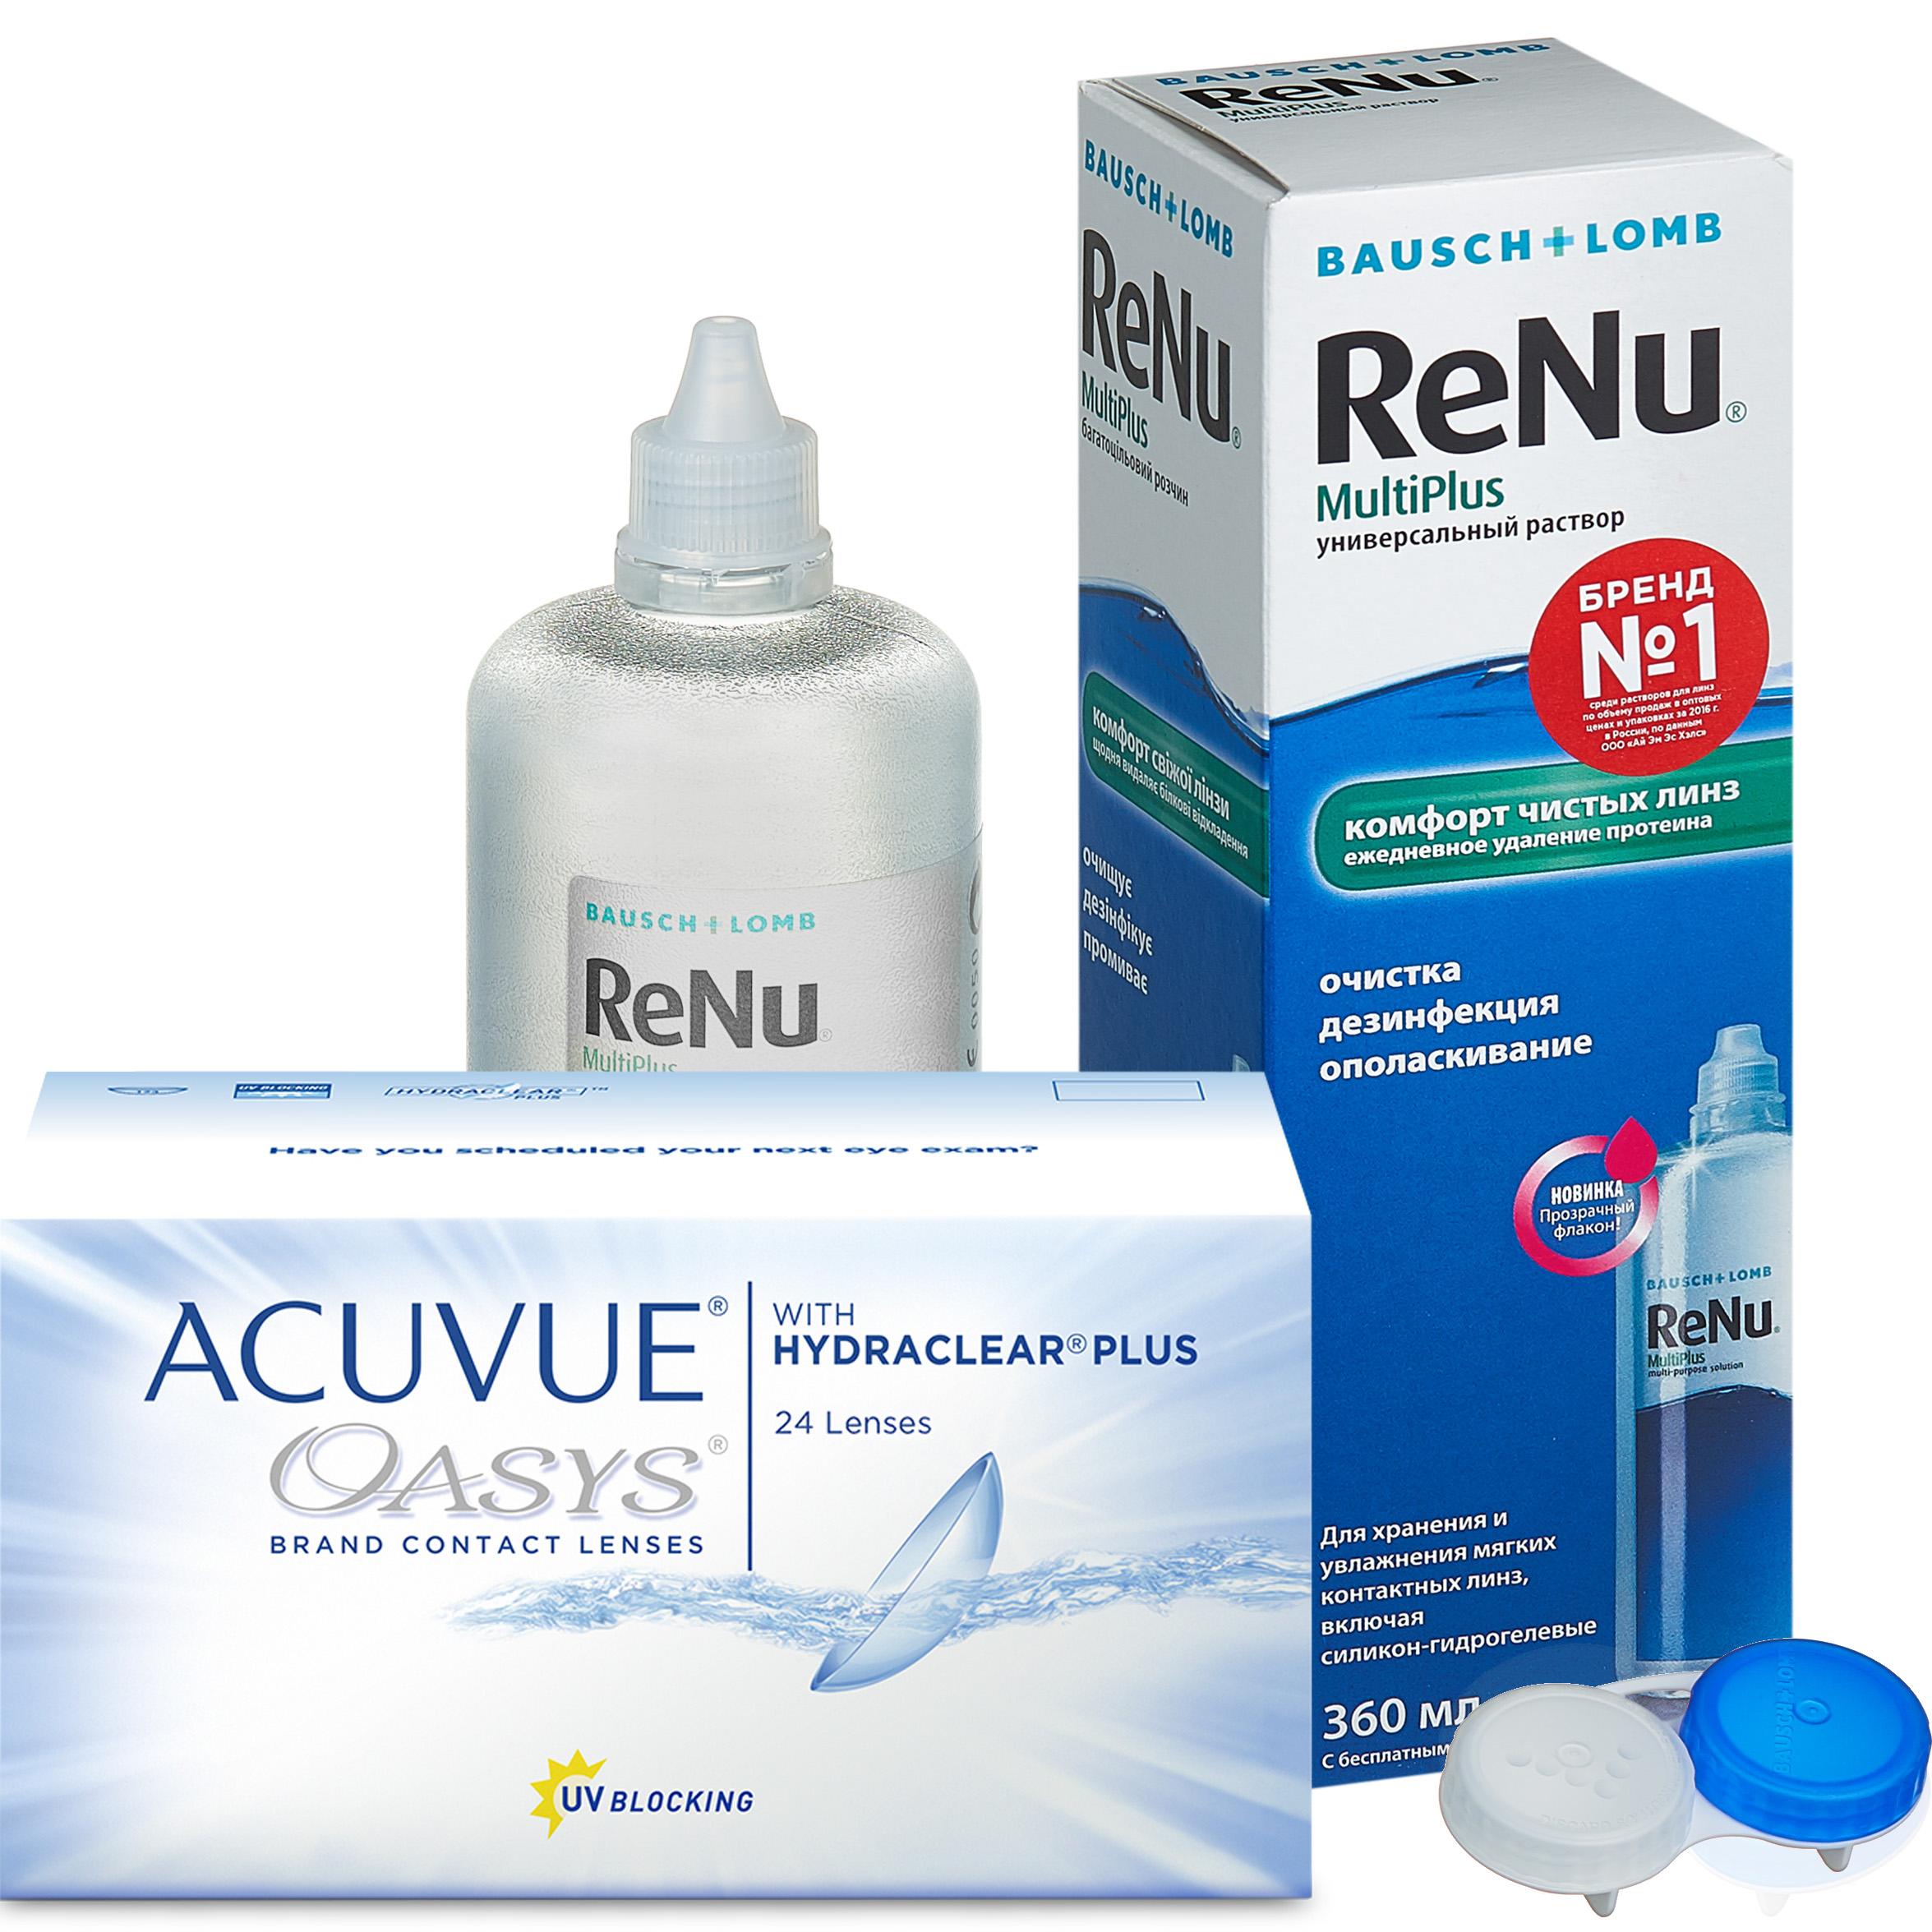 Купить Oasys with Hydraclear Plus 24 линзы + ReNu MultiPlus, Линзы Acuvue Oasys with Hydraclear Plus 24 линзы R 8.4 -2, 00 + ReNu Multi Plus 360 мл